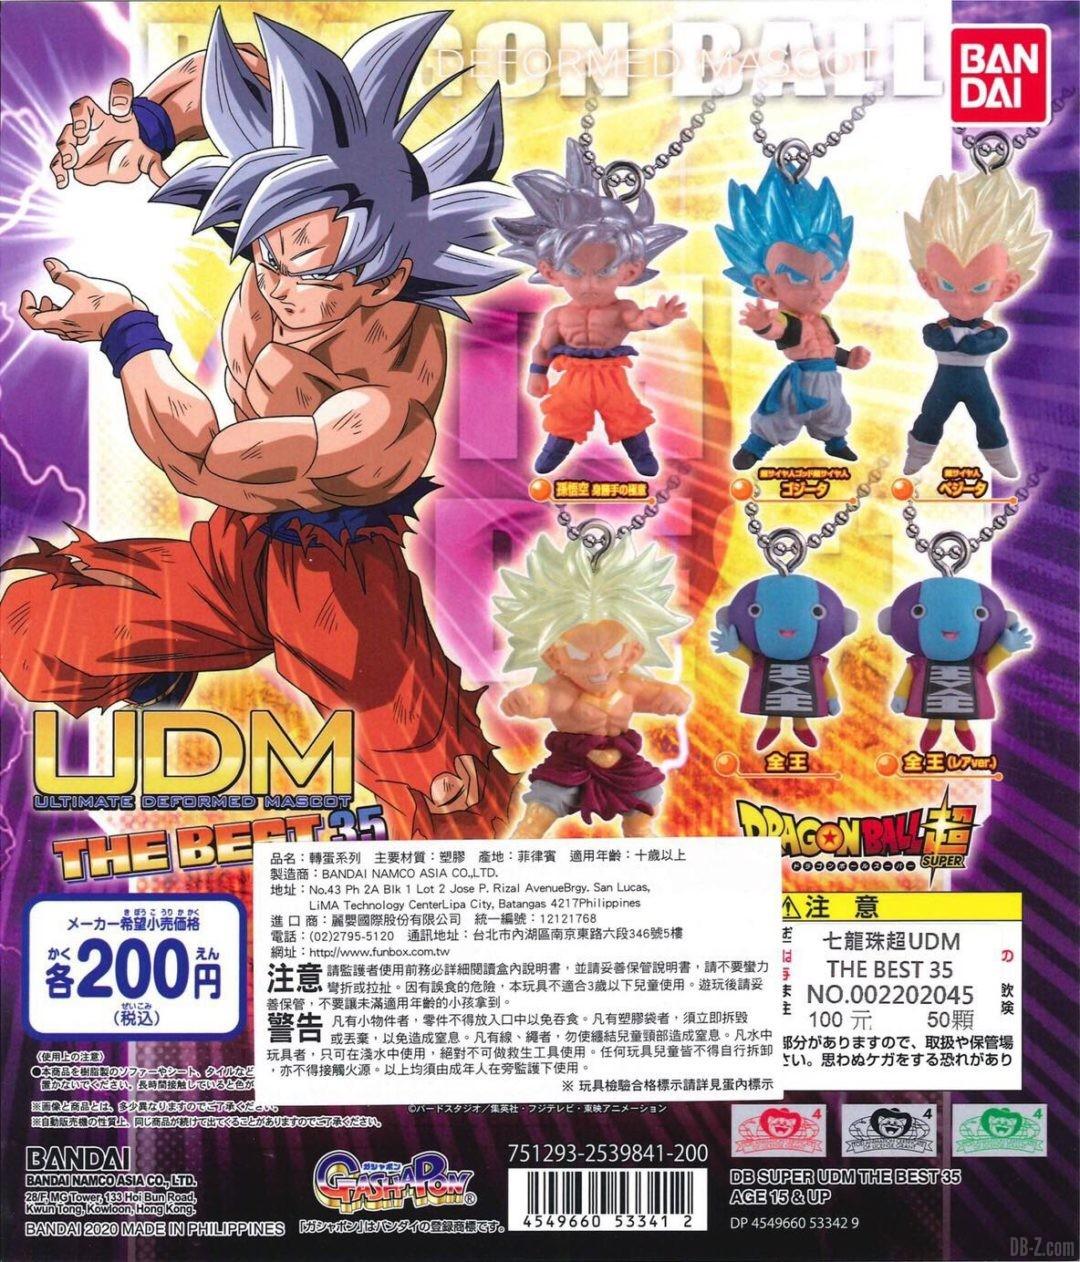 UDM The Best 35 Promo